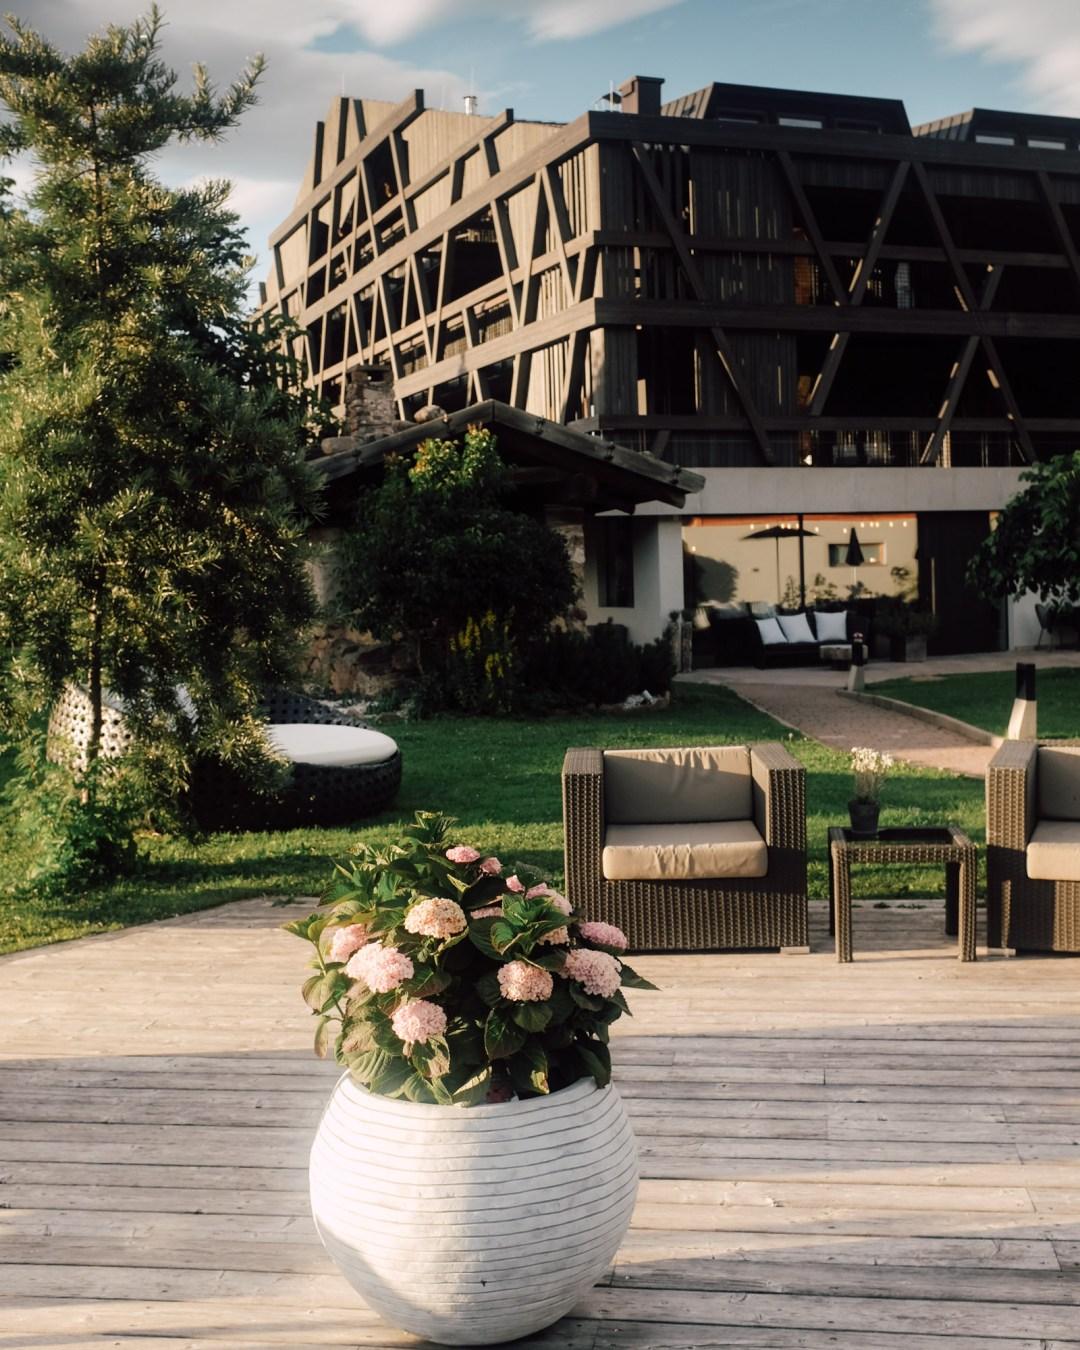 Inastil, Südtirol, Vitalpinahotels, Pflösl, Deutschnofen, Eggental, Latemar, Dolomiten, Travelblogger, Ü50Blogger, Urlaub, Ü50Lifestyle, Reiseblogger, Ü50Reisen-73